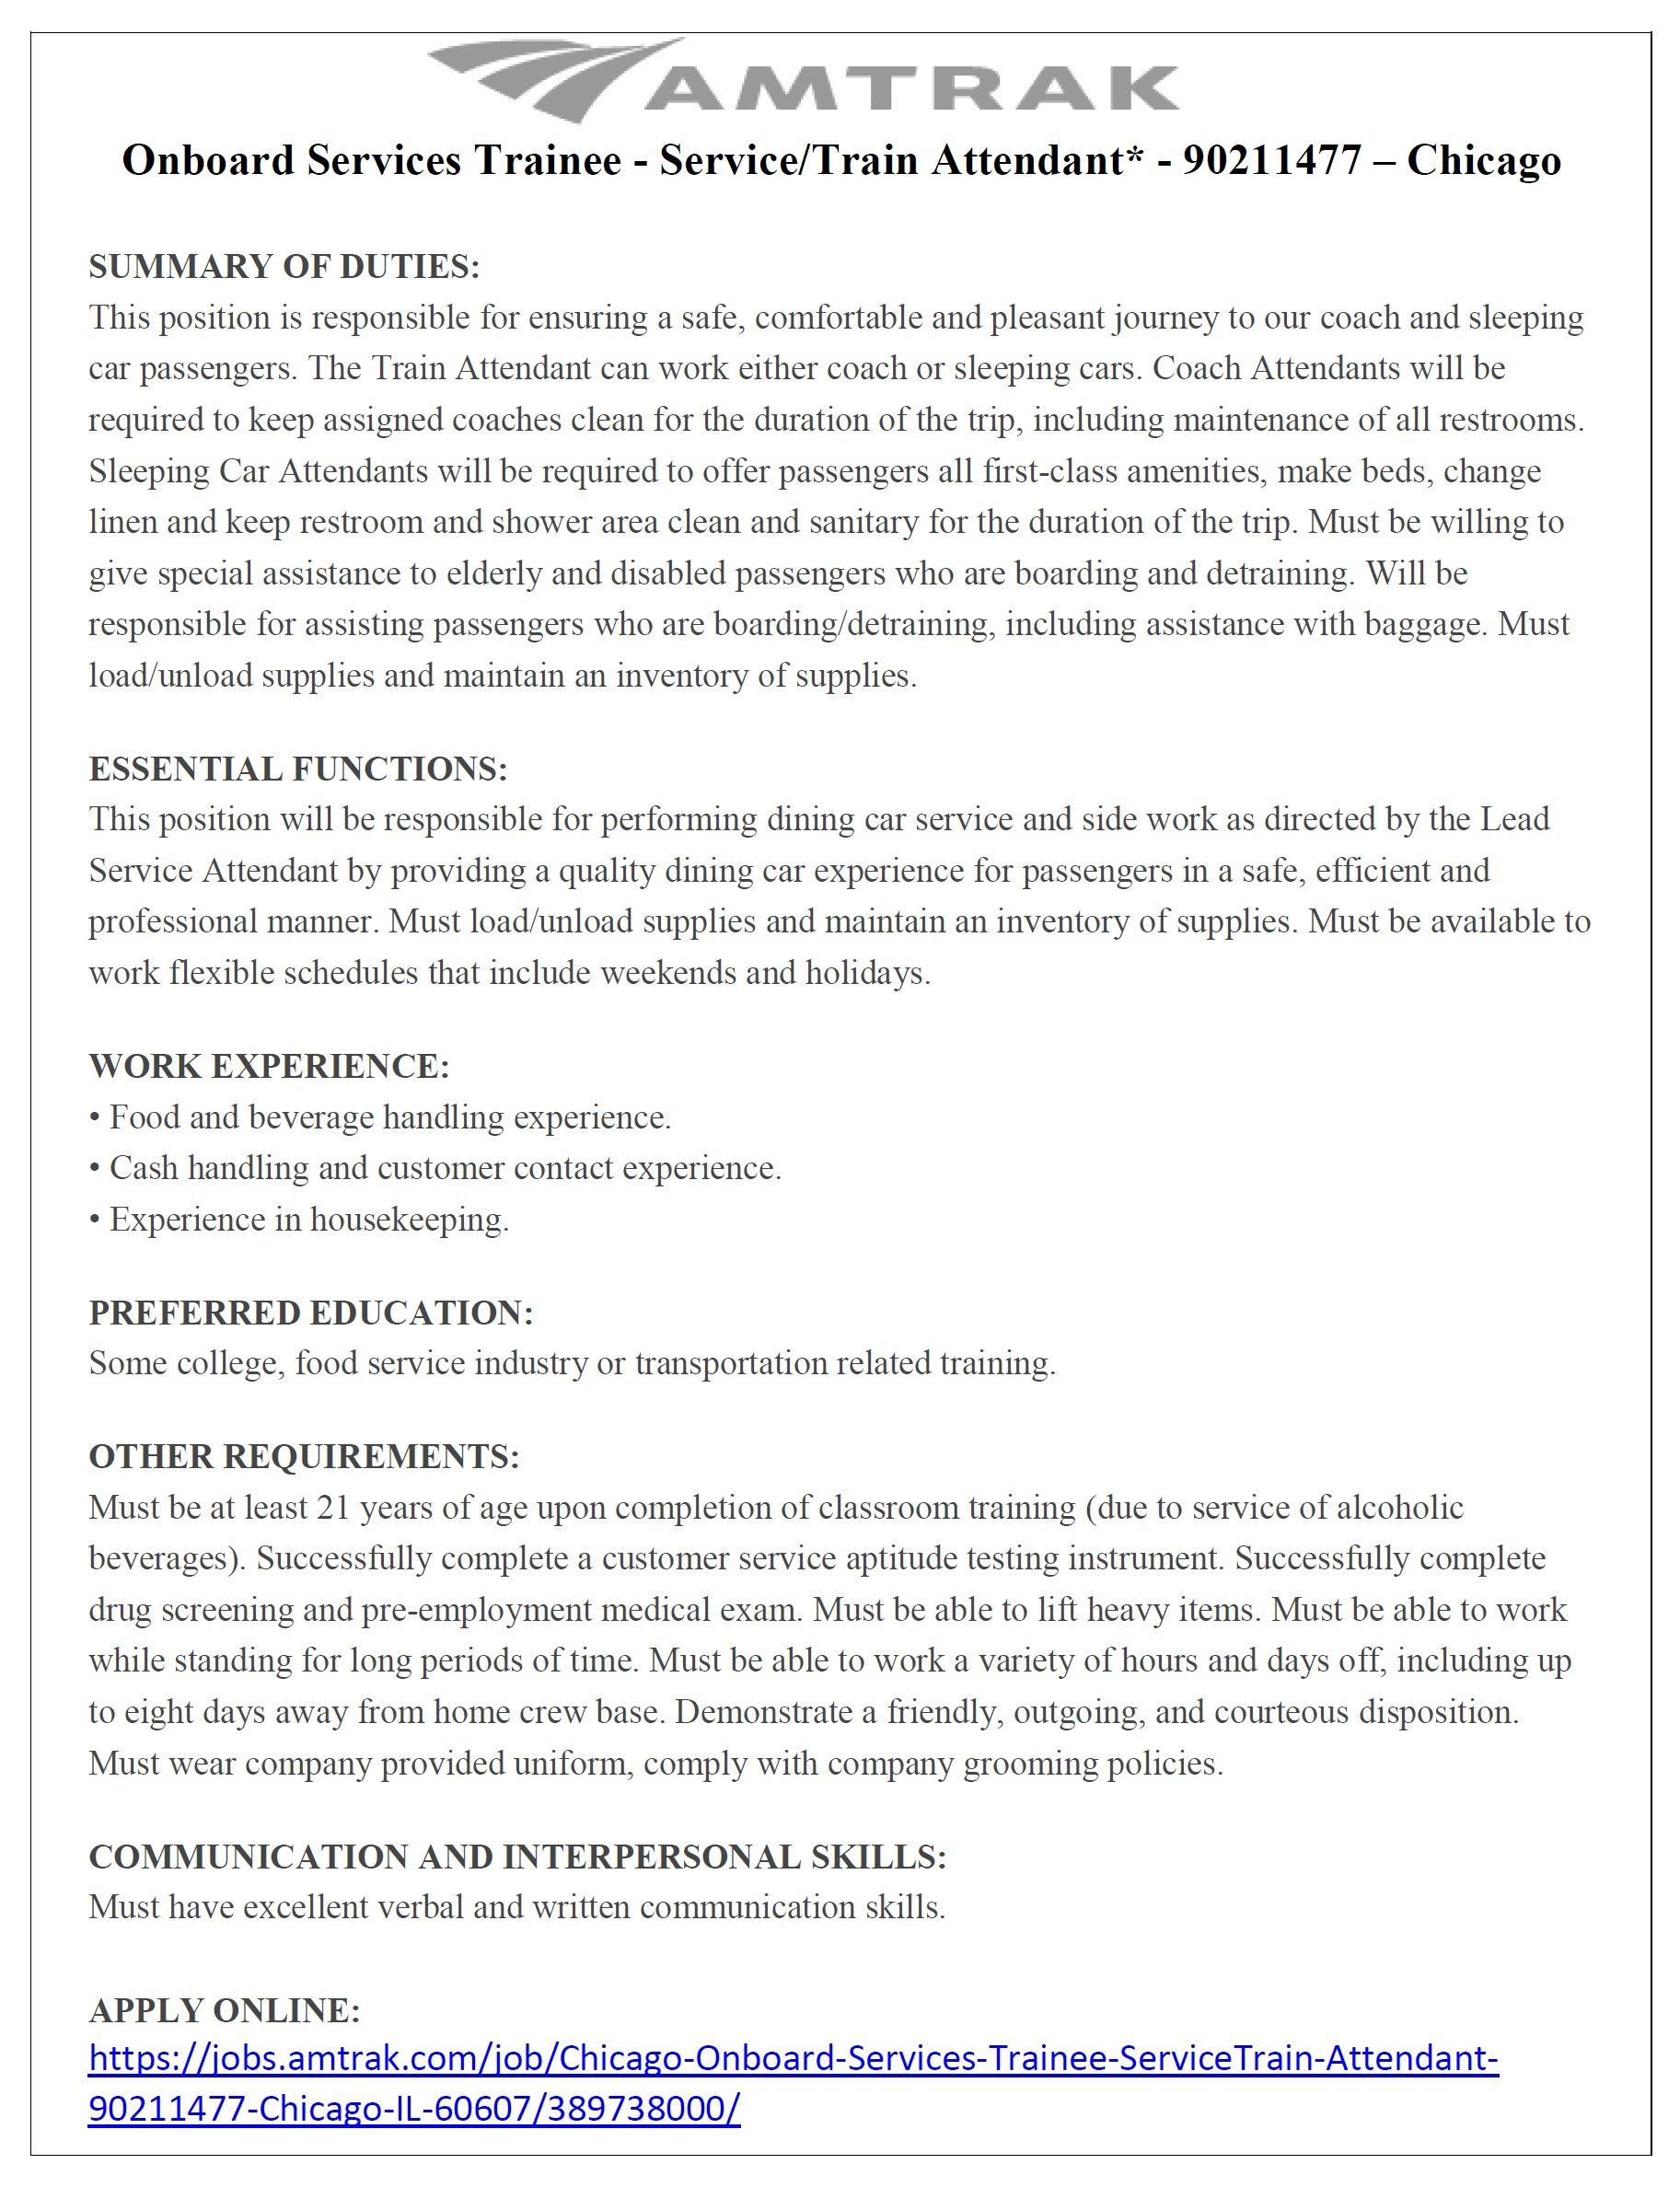 city of chicago opportunities alderman jason c ervin amtrak is hiring now